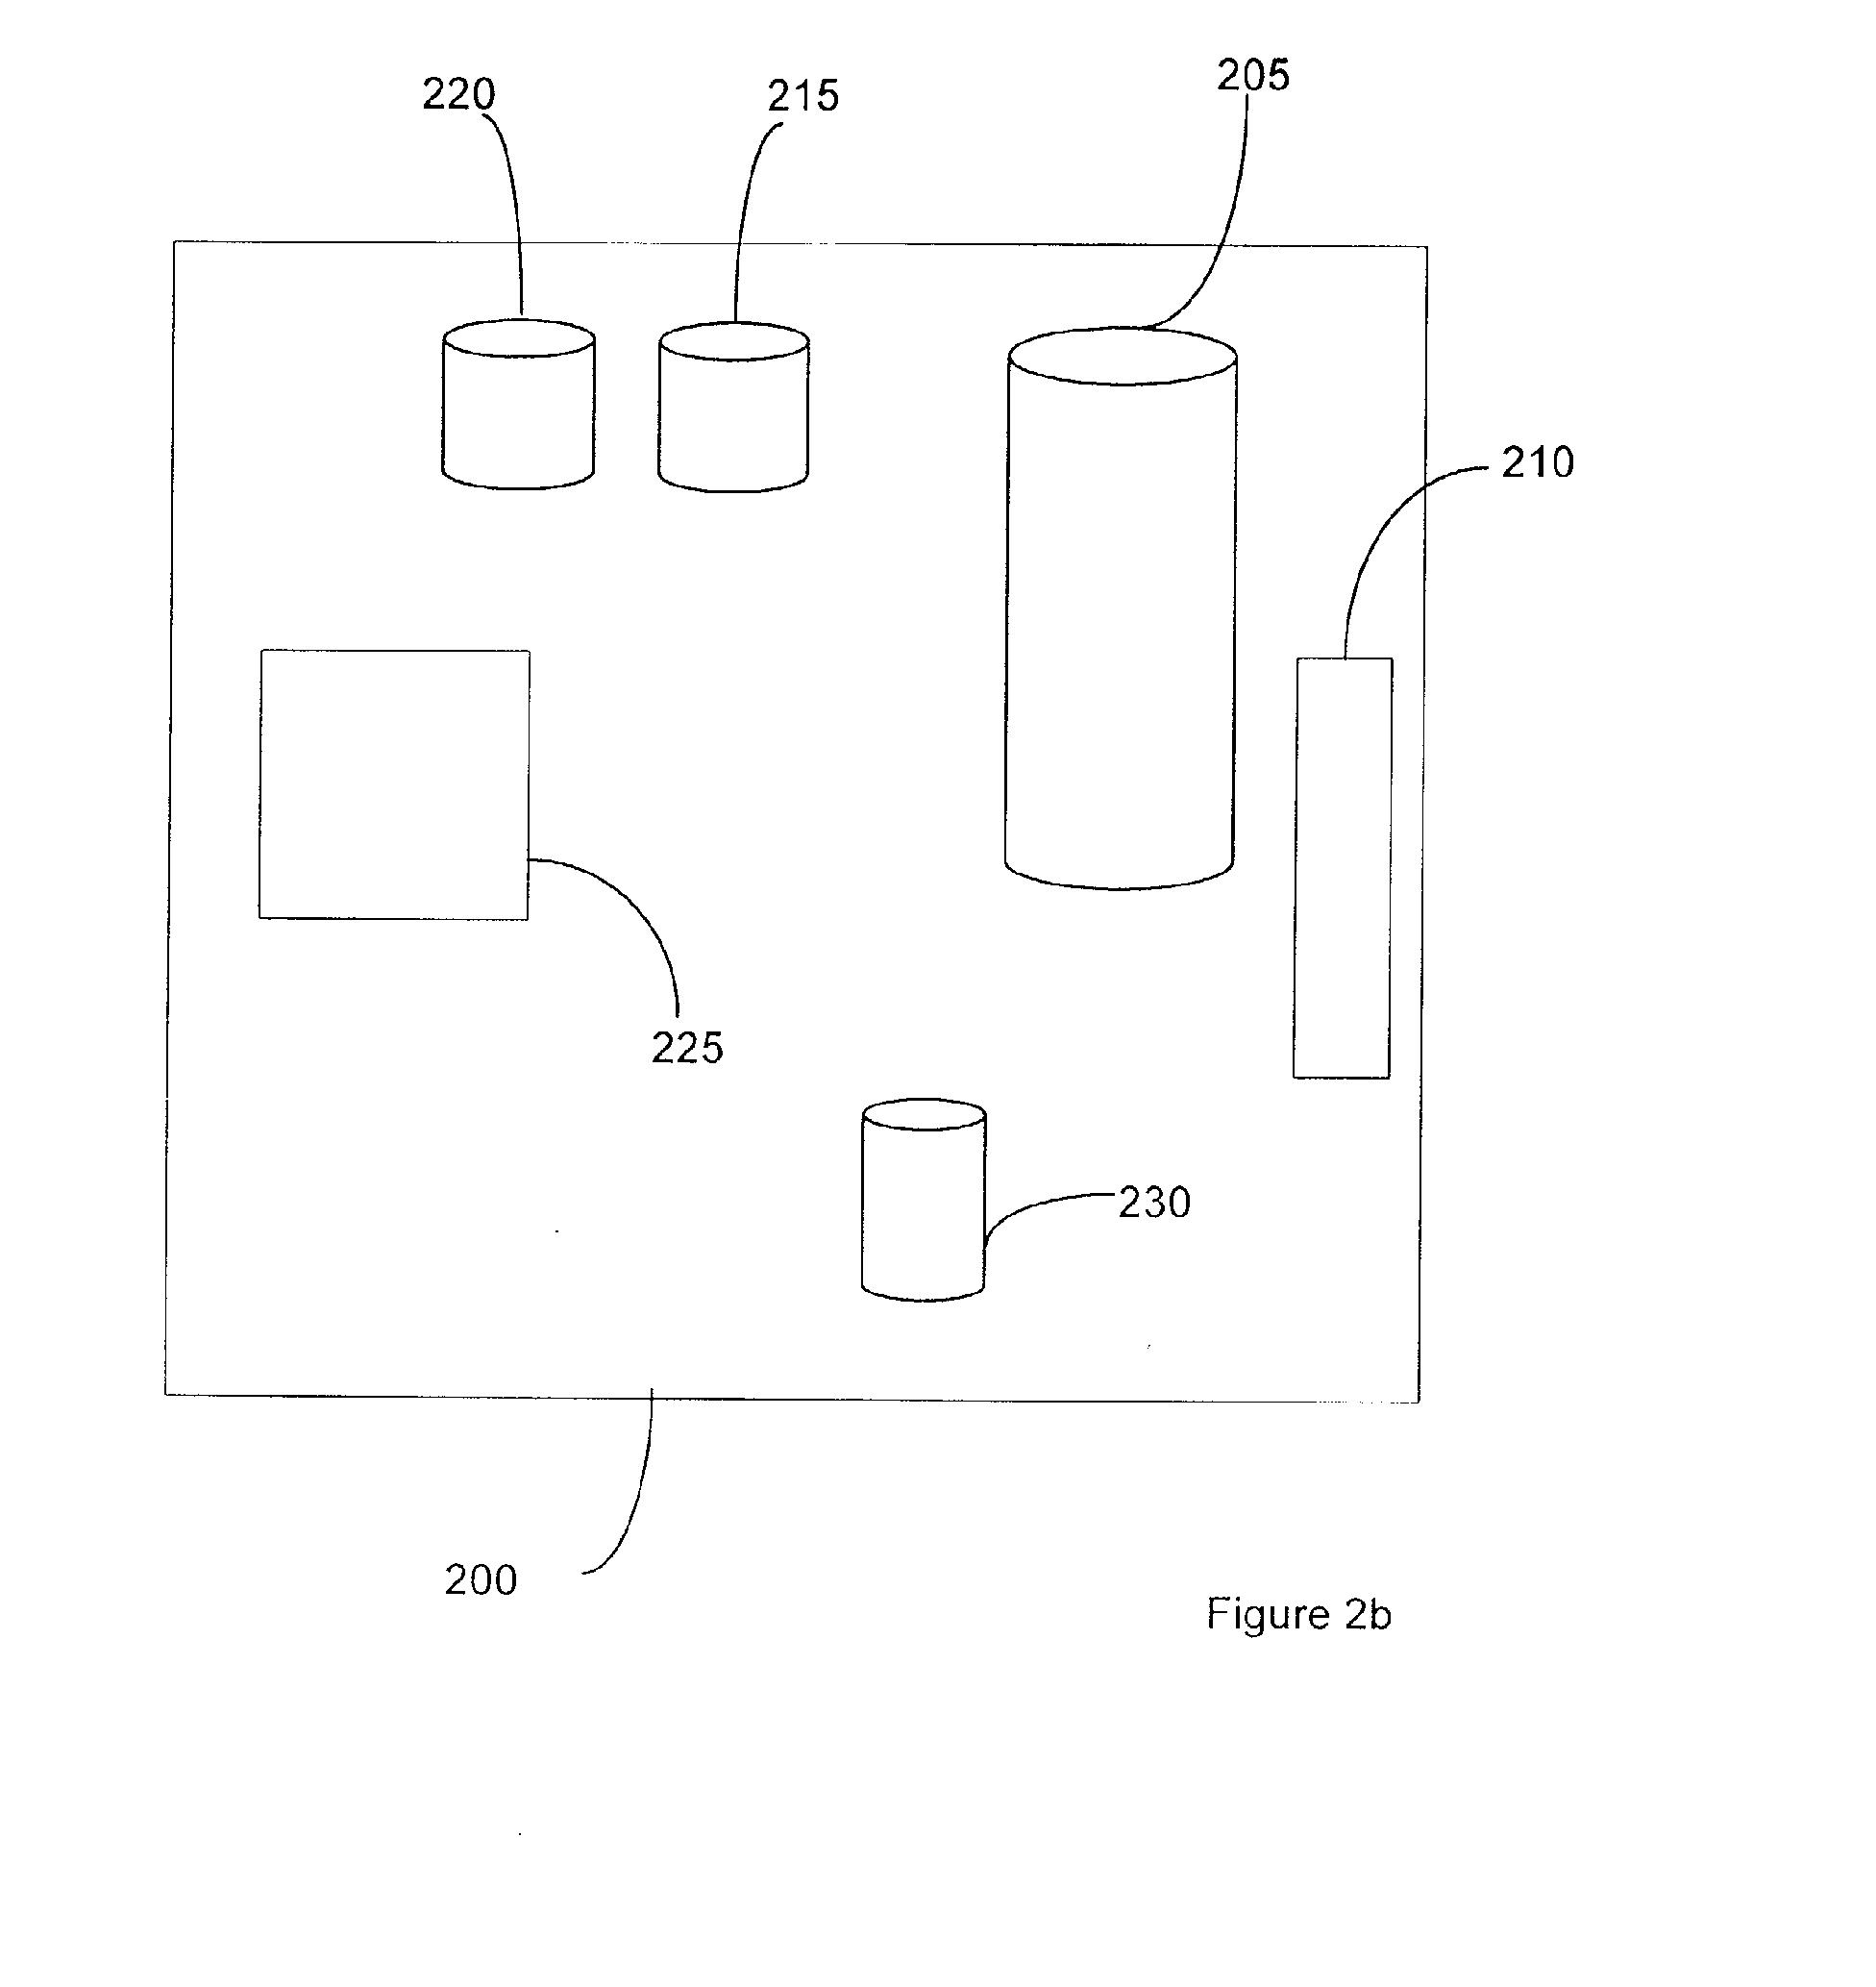 专利ep1422952a1 - a bi-directional